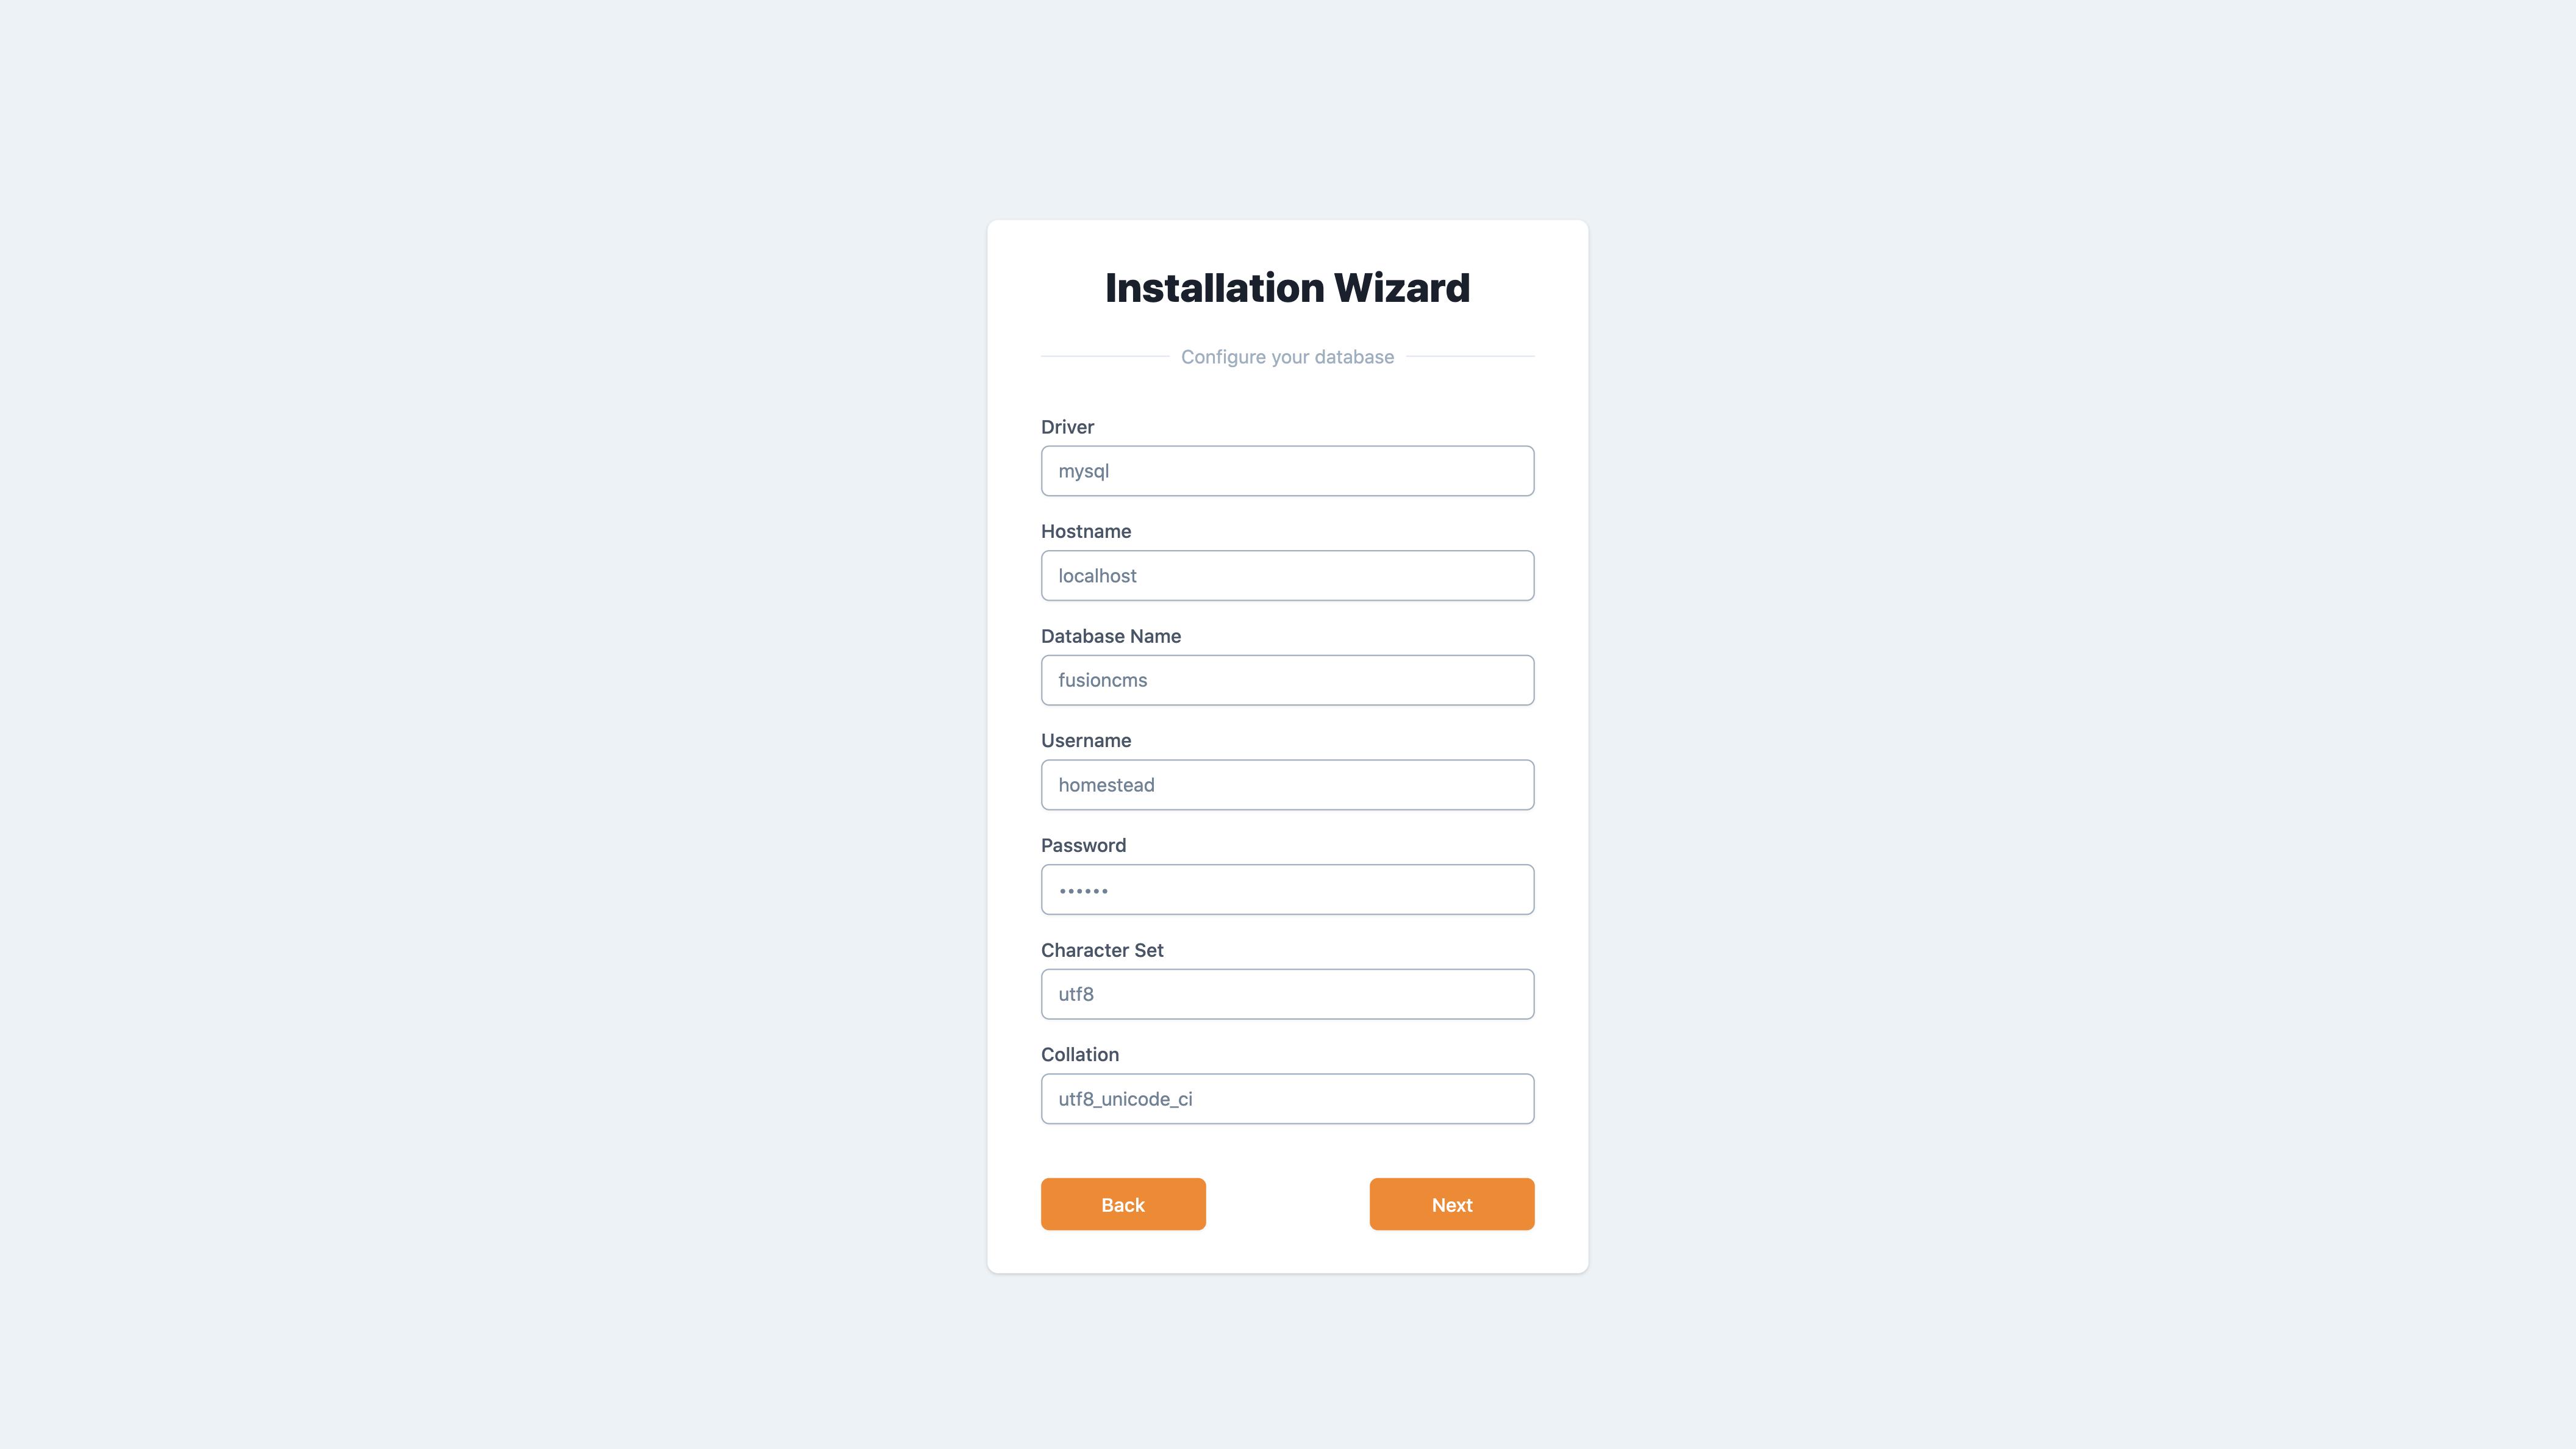 Visual Installation Wizard